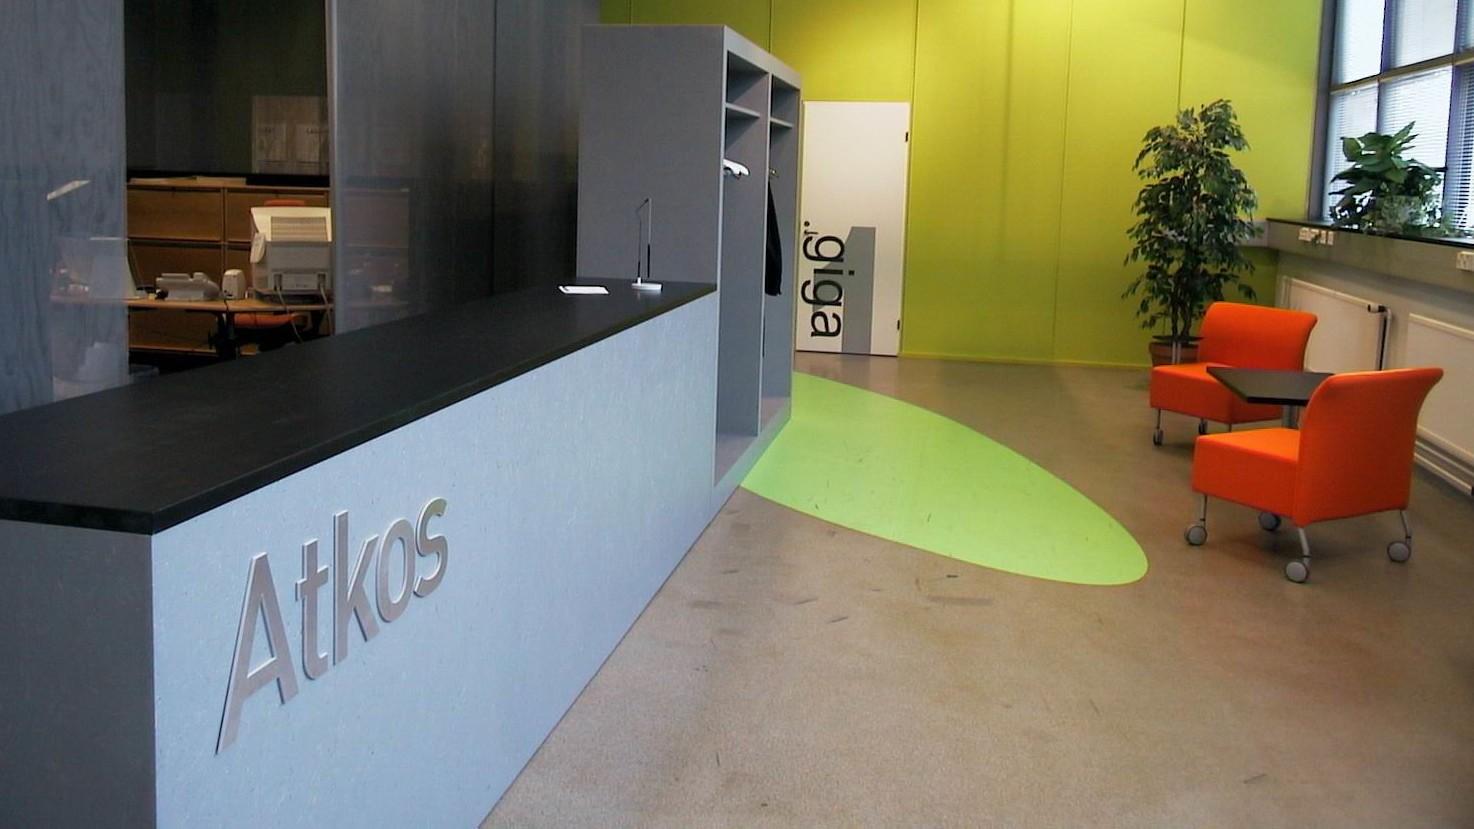 Atkos-Helsinki-GI-Project-8